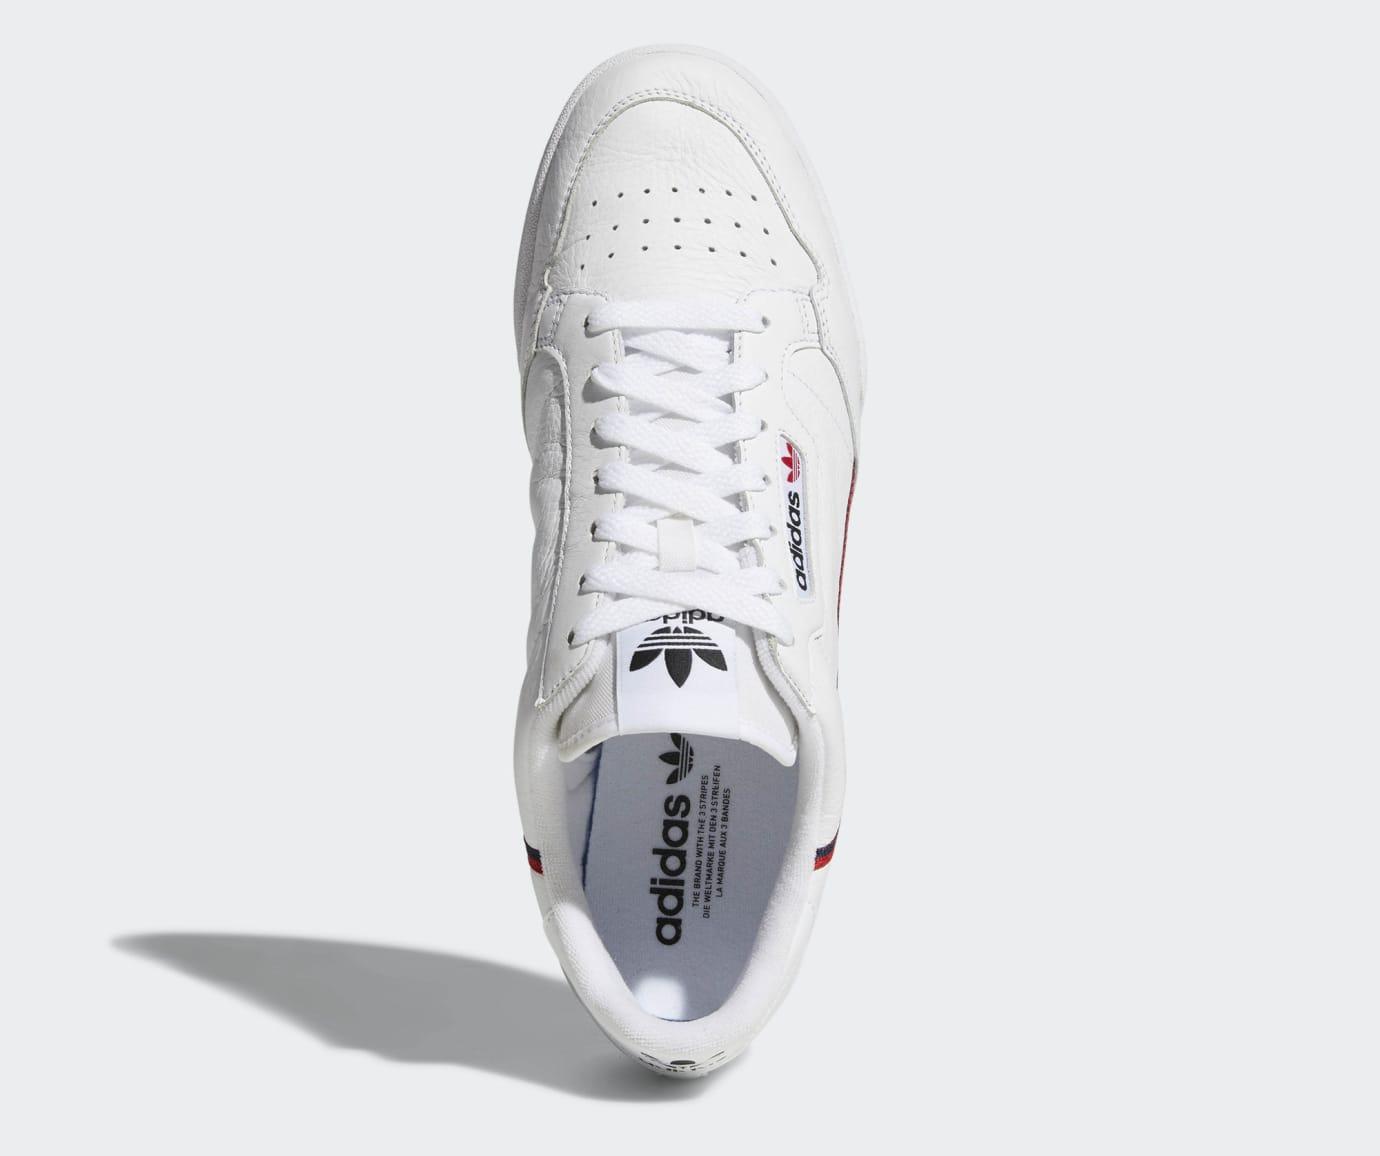 promo code 6c6e6 83a54 Image via Adidas Adidas Continental 80 Rascal B41674 (Top)